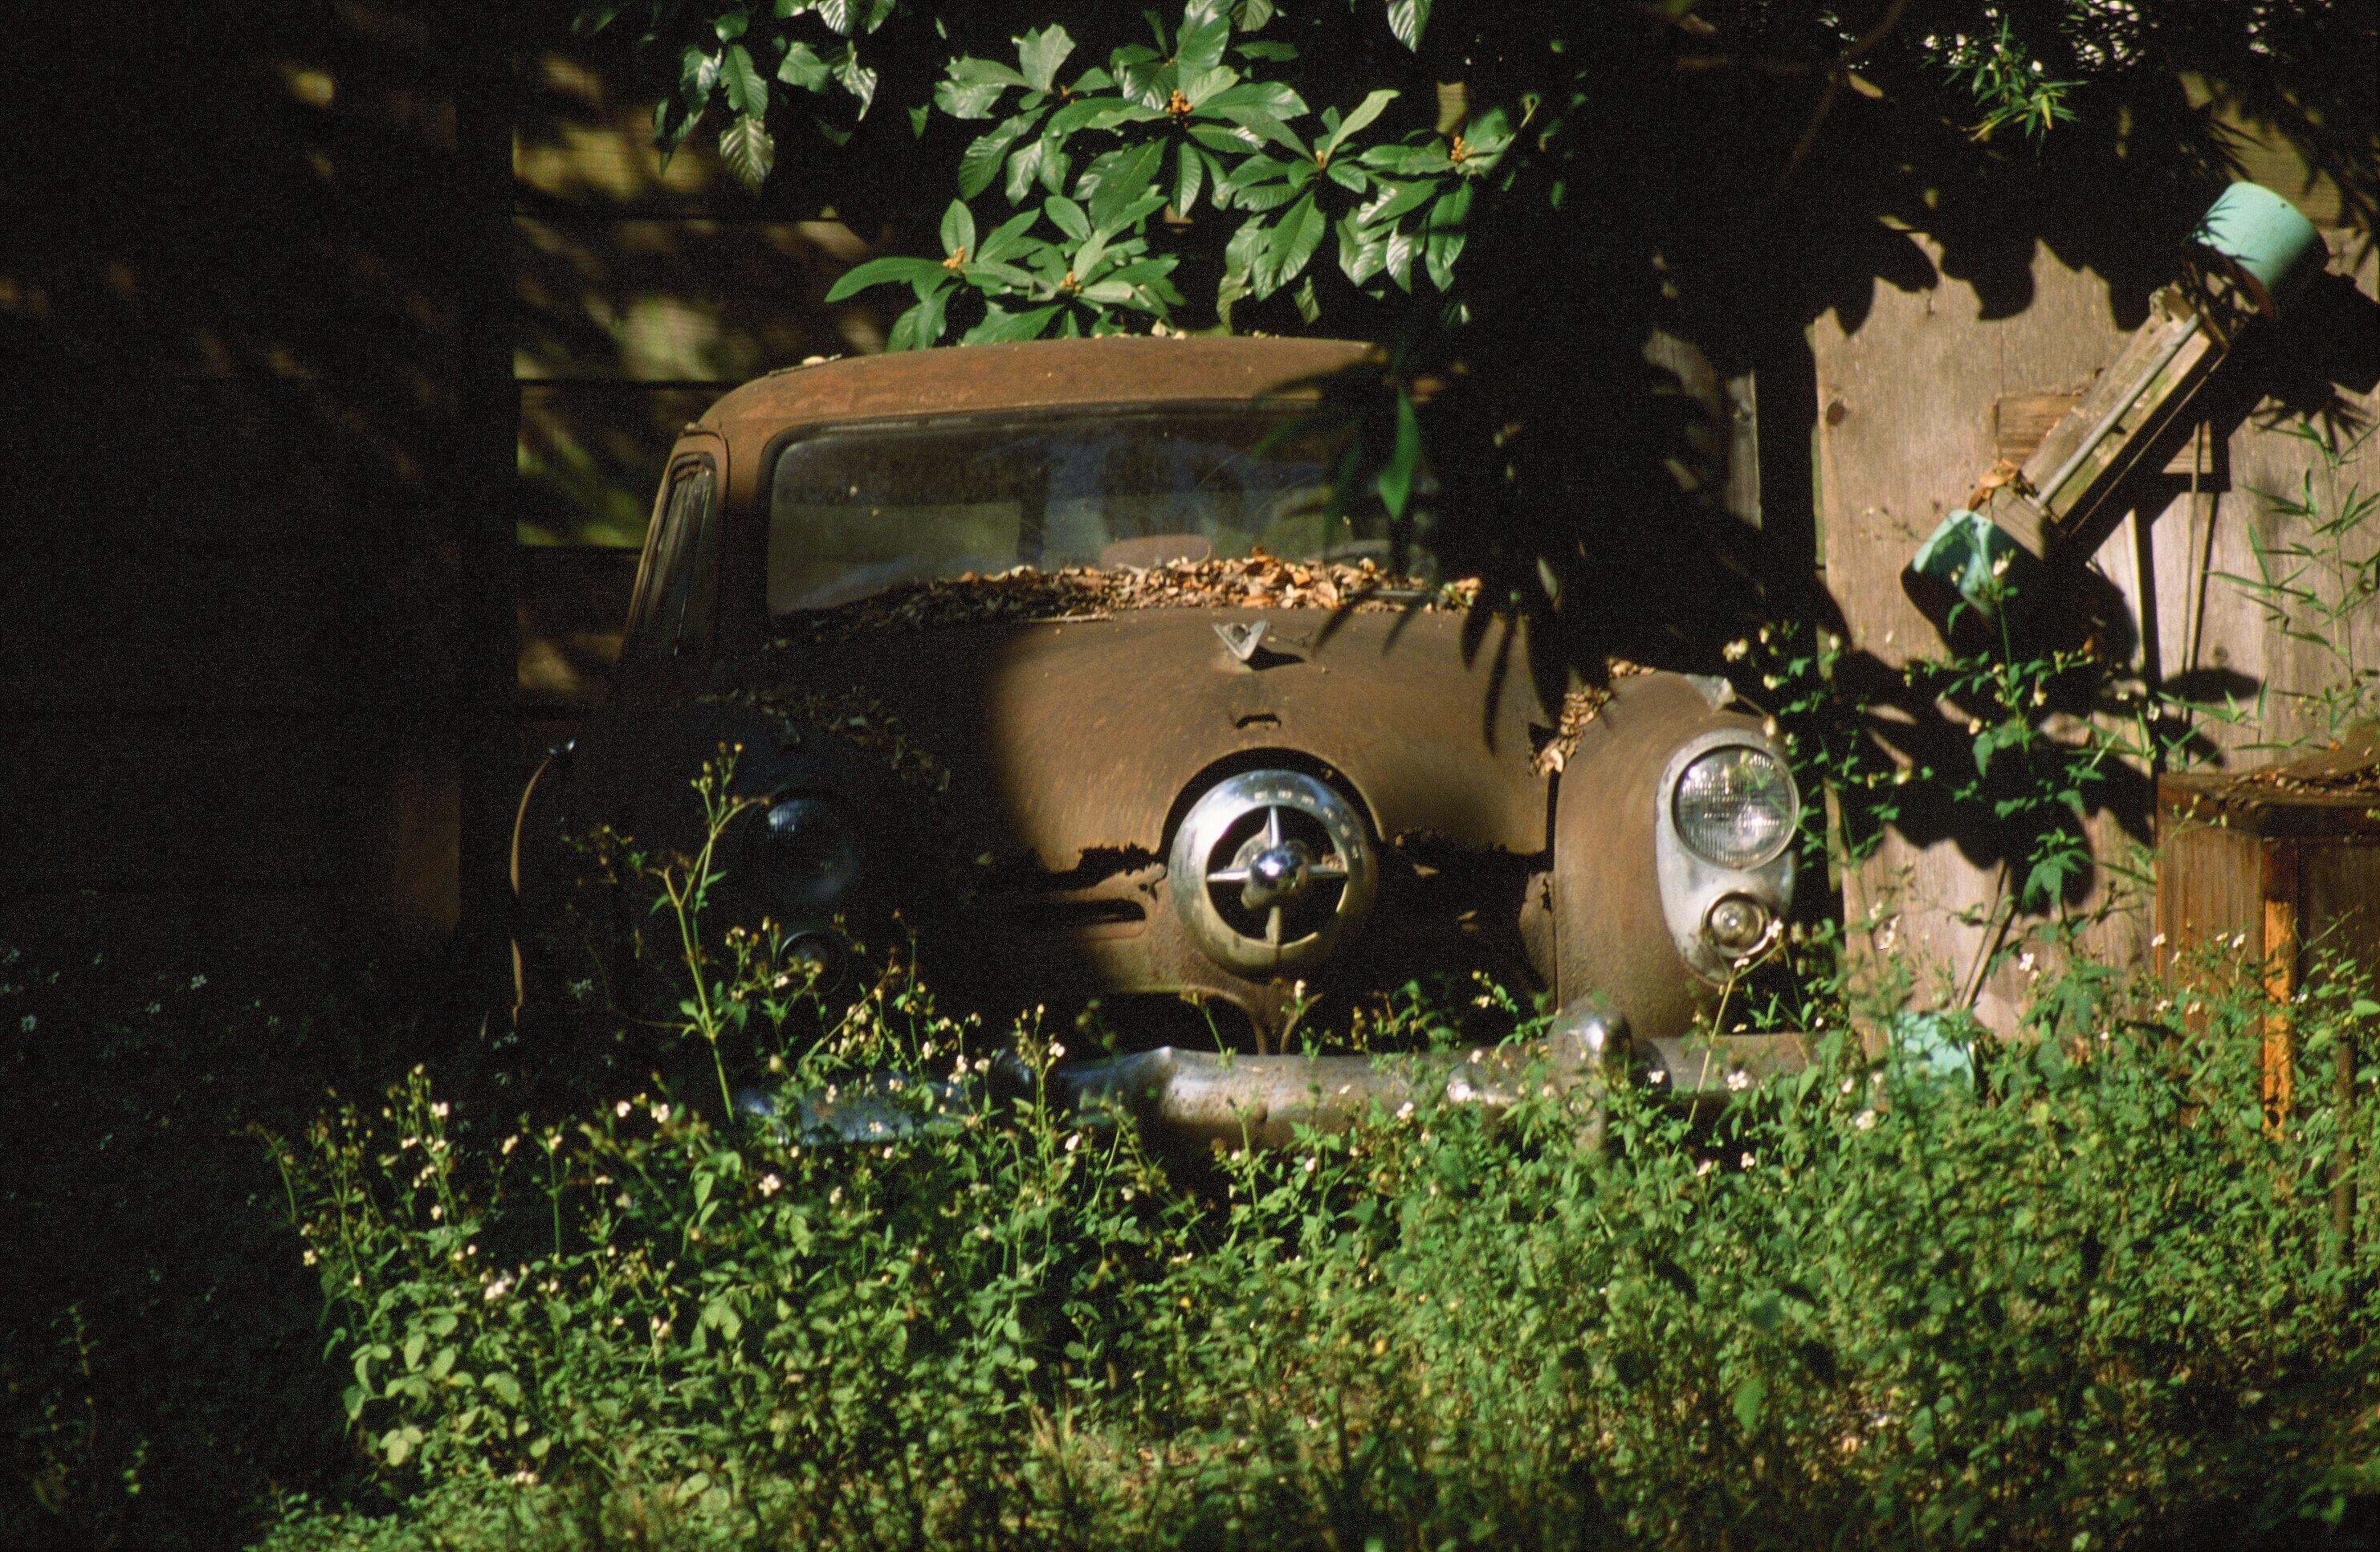 Old Car Weeds